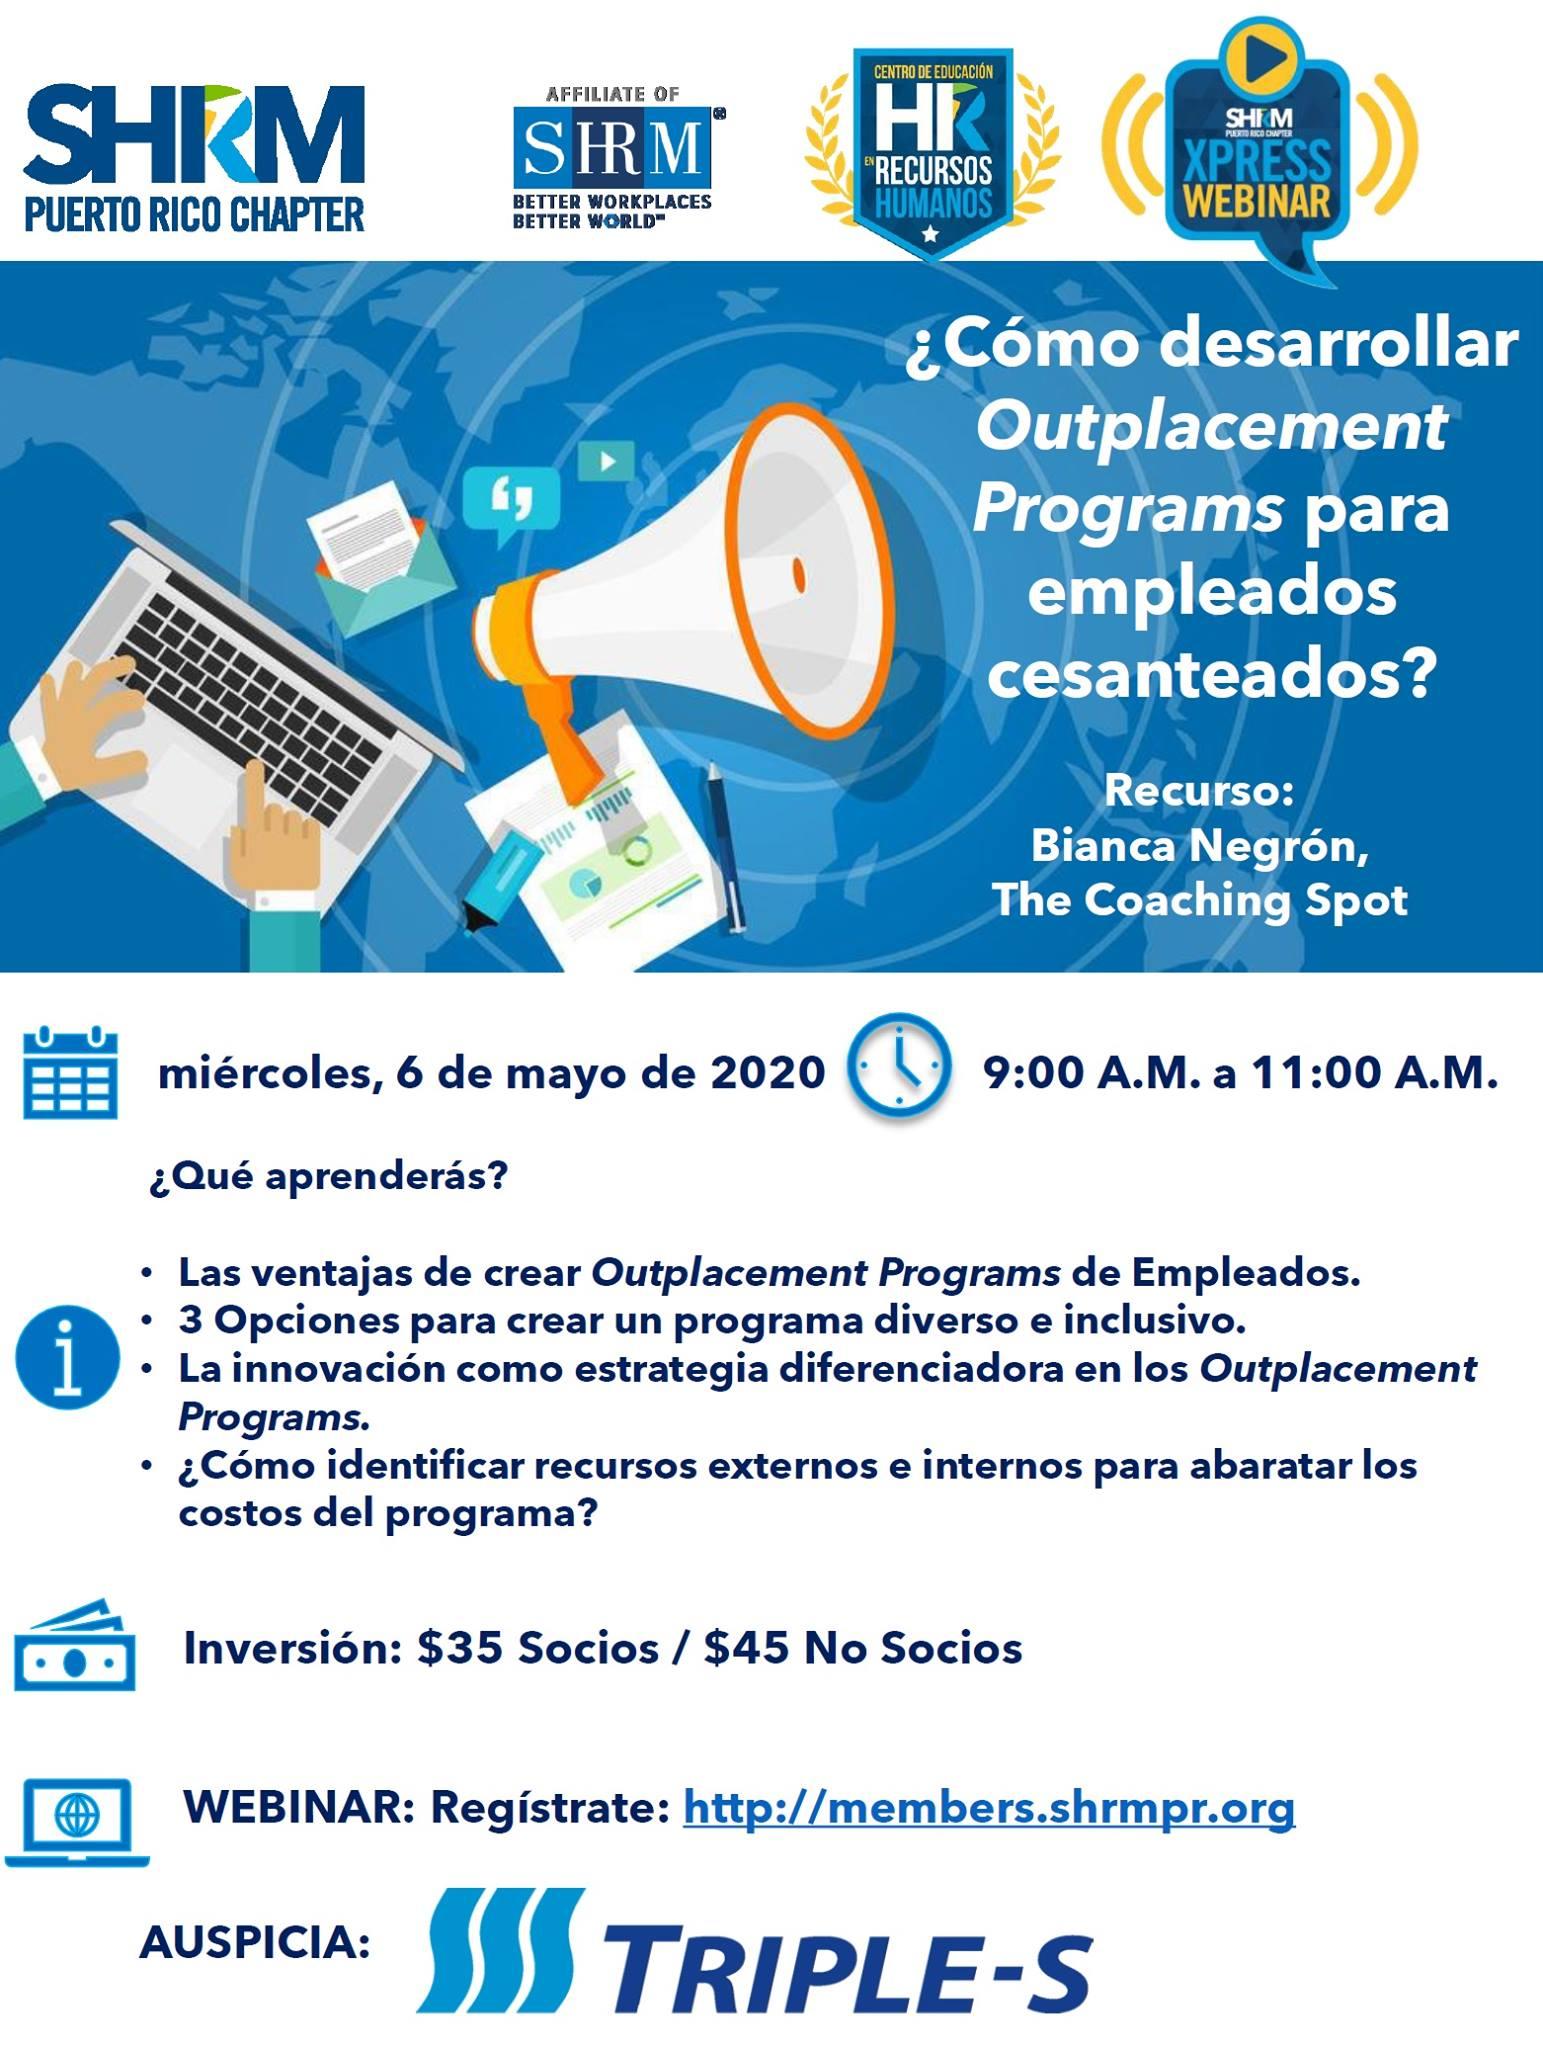 "shrm outplacement programs 5 Razones para que las empresas desarrollen ""Outplacement Programs"" Bianca Negrón"